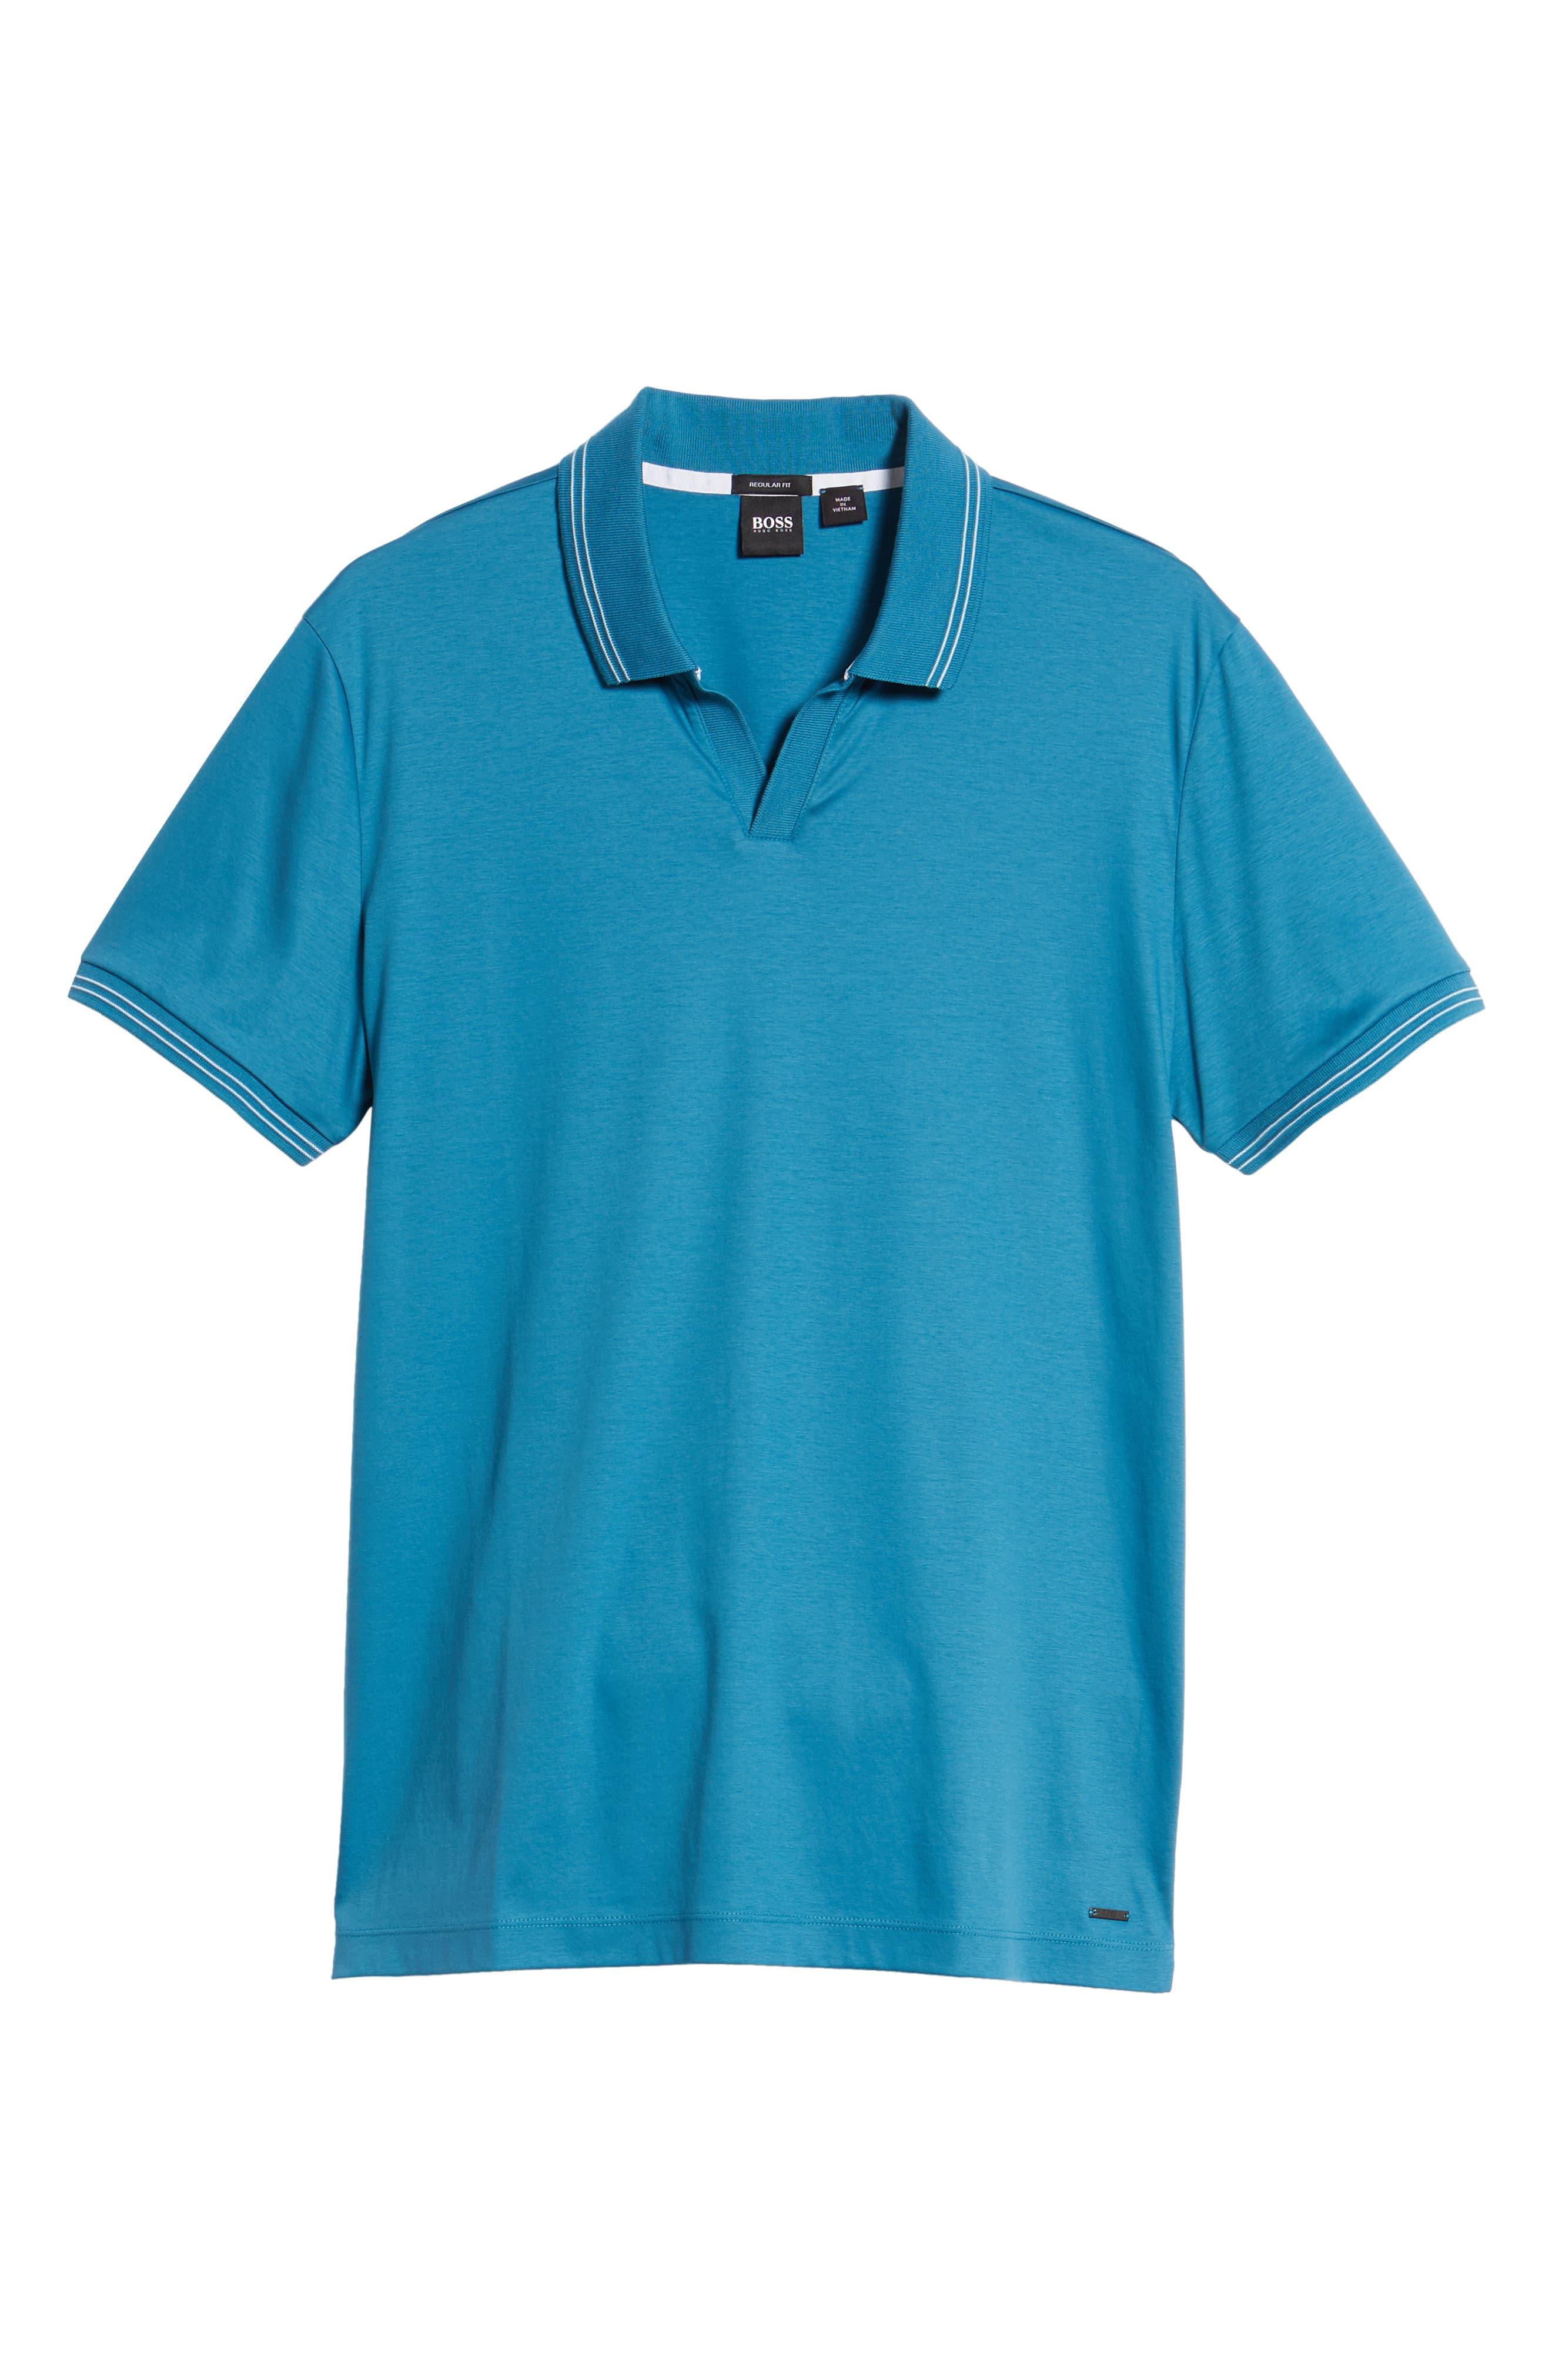 Parlay Johnny Polo Shirt,                             Alternate thumbnail 6, color,                             400